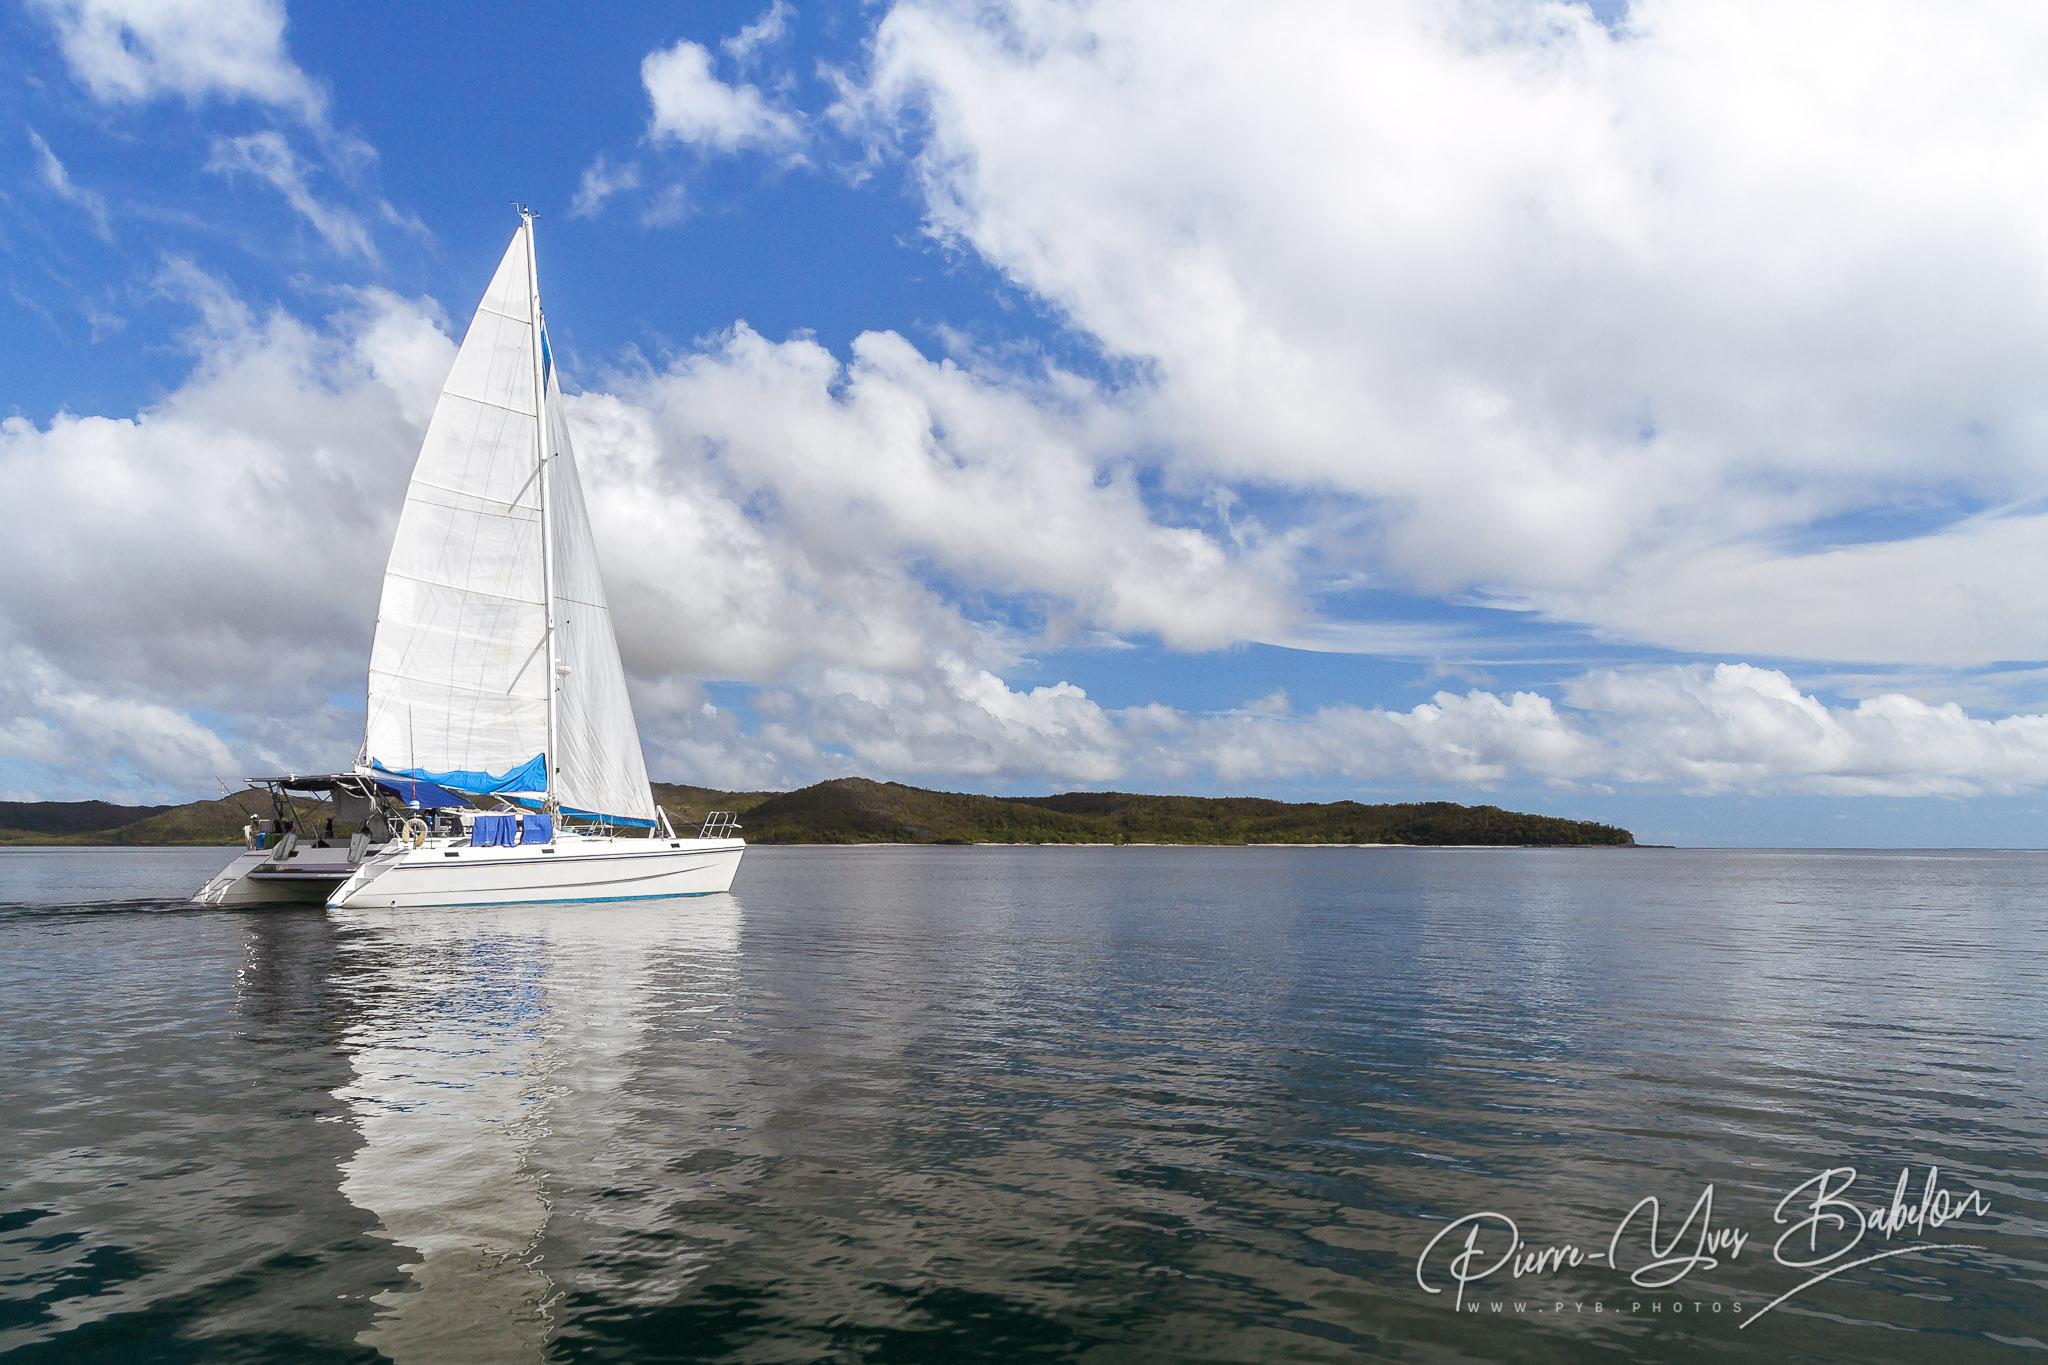 Luxury catamaran in the bay